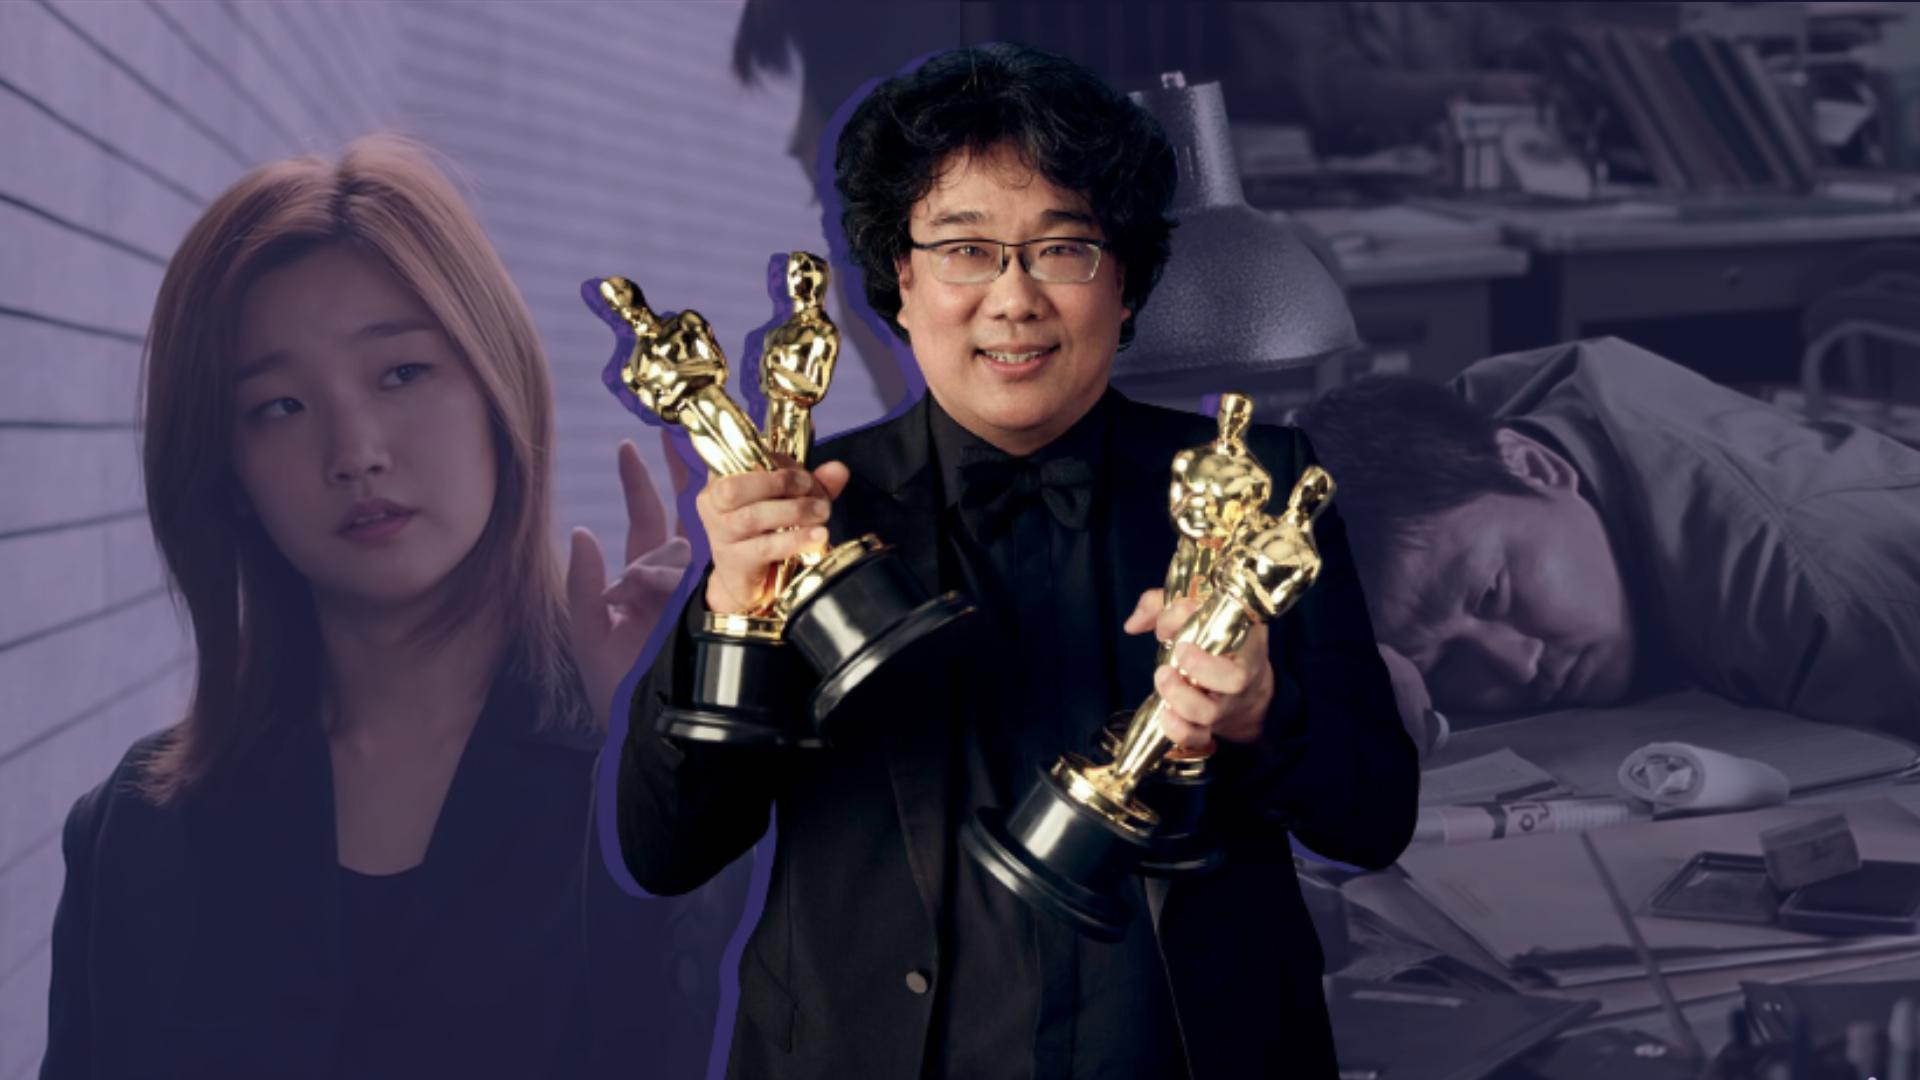 Bong Joon Ho Starter Pack: 8 Must-Watch Films from the Award-Winning Director